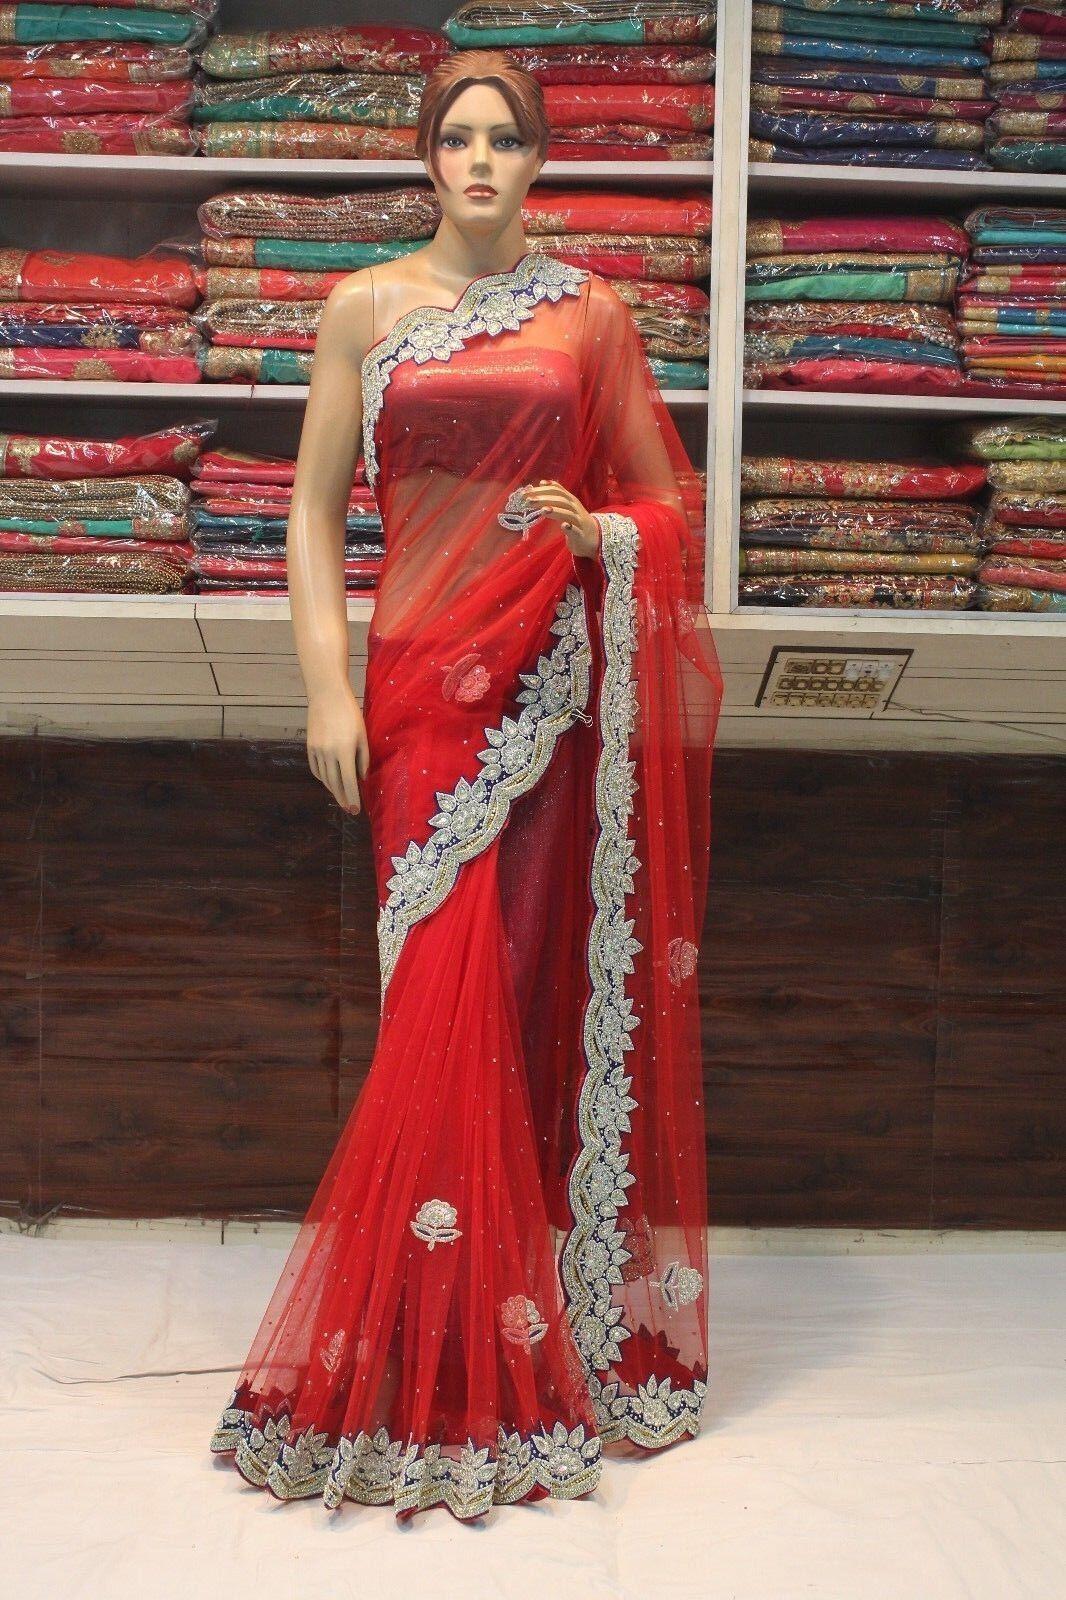 BOLLYWOOD INDIAN RED ZIRCON WORK NET CUT WORK SAREE SARI BRIDAL PARTY DRESS